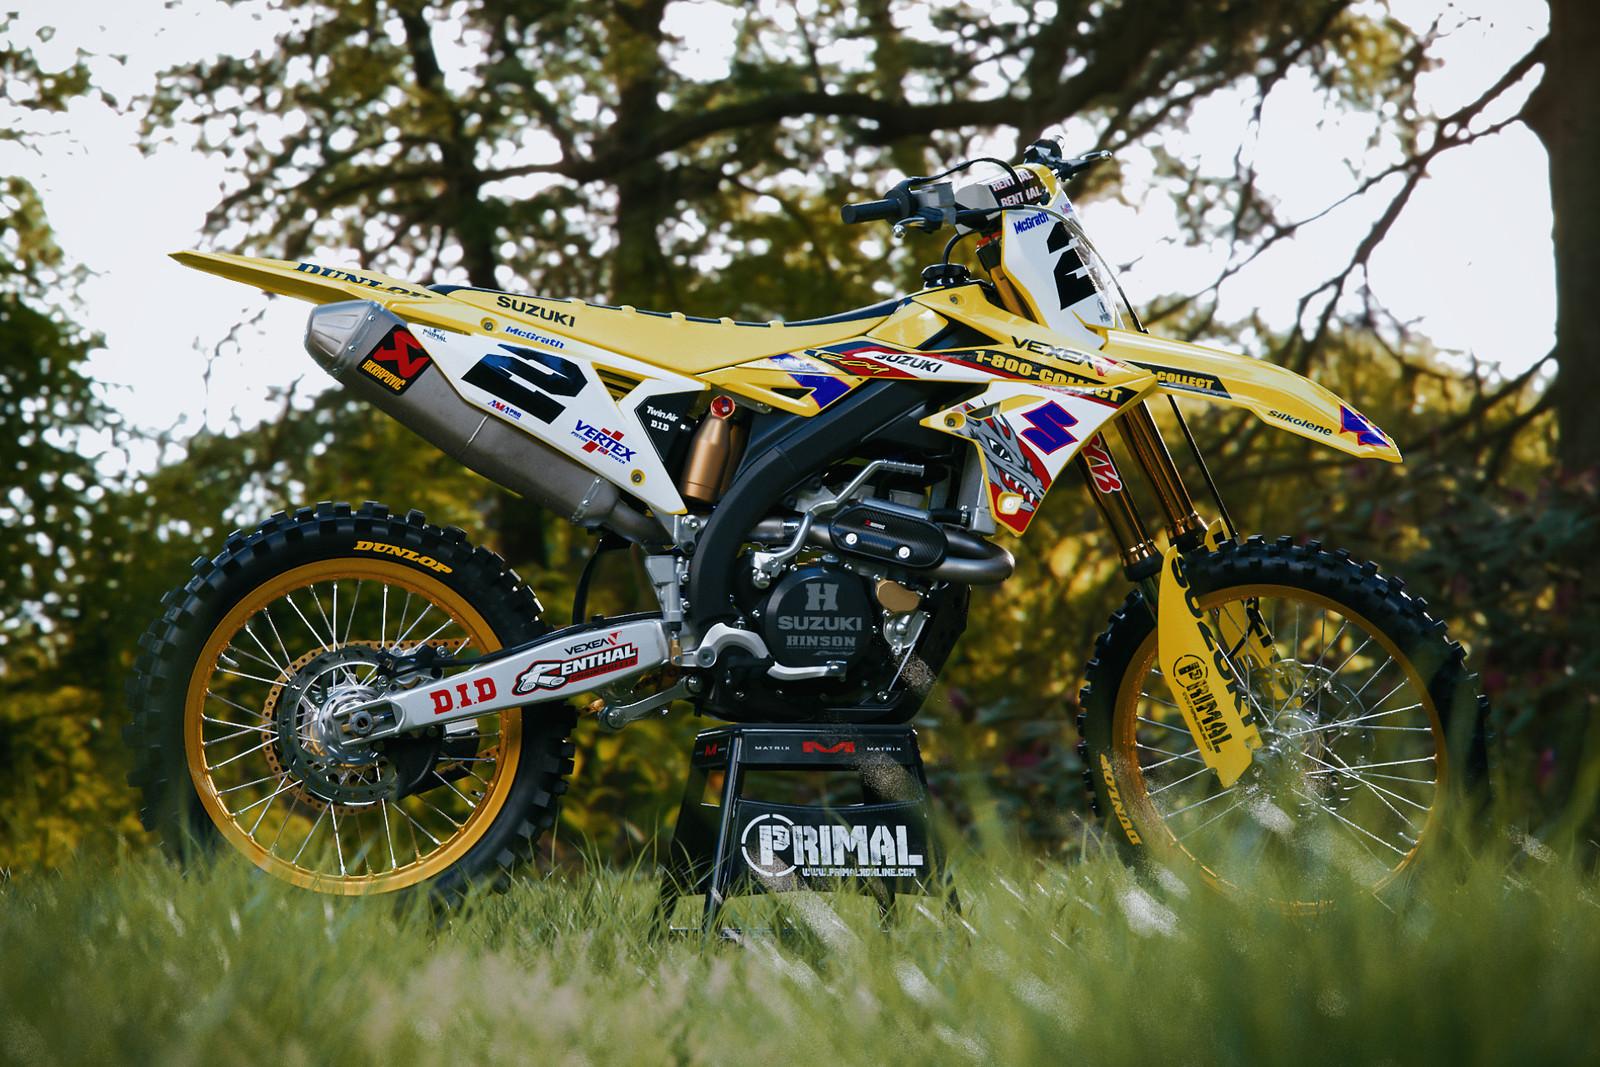 PRIMAL X MOTORSPORTS   MX GRAPHICS   McGrath Replica  2018 RMZ - PRIMAL_X_MOTORSPORTS - Motocross Pictures - Vital MX